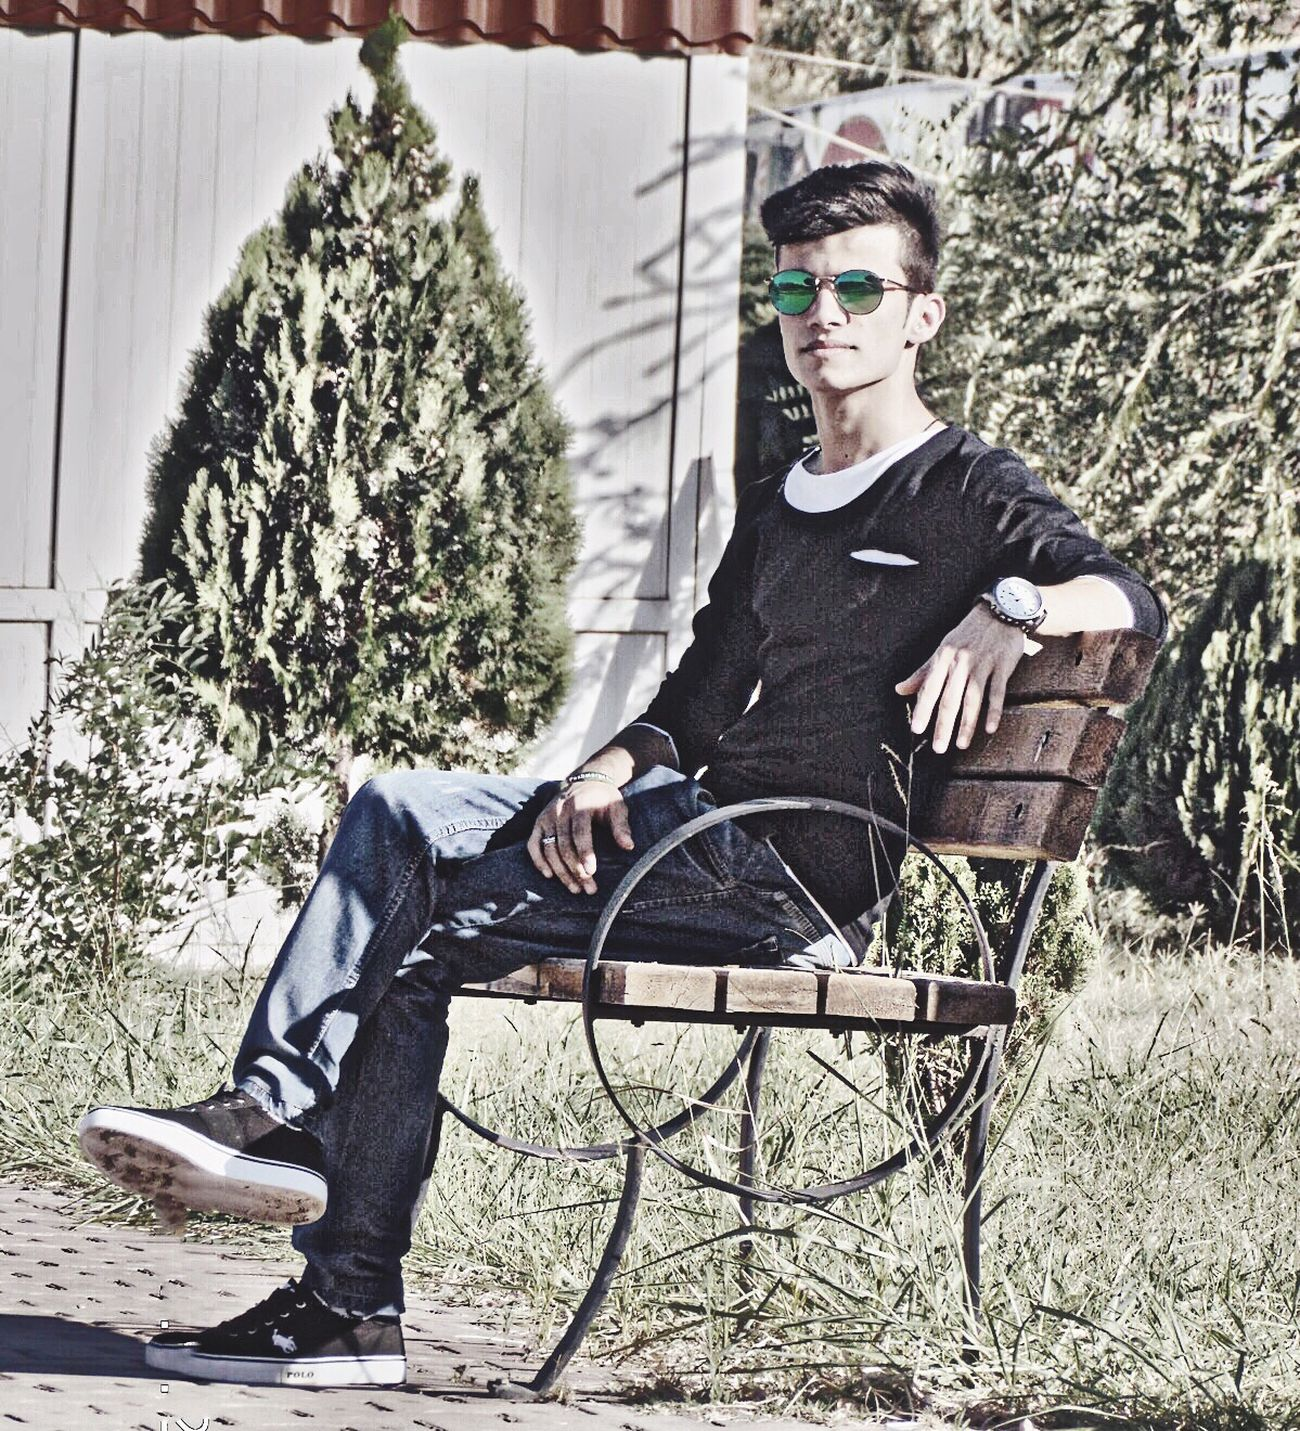 Me 😎 That's Me Hello World Enjoying Life Kurdishboy Bjit Peşmerge I ❤️ Kurdistan Photography Style Kik Me ♥ Kurdm Roko.8 Instagram